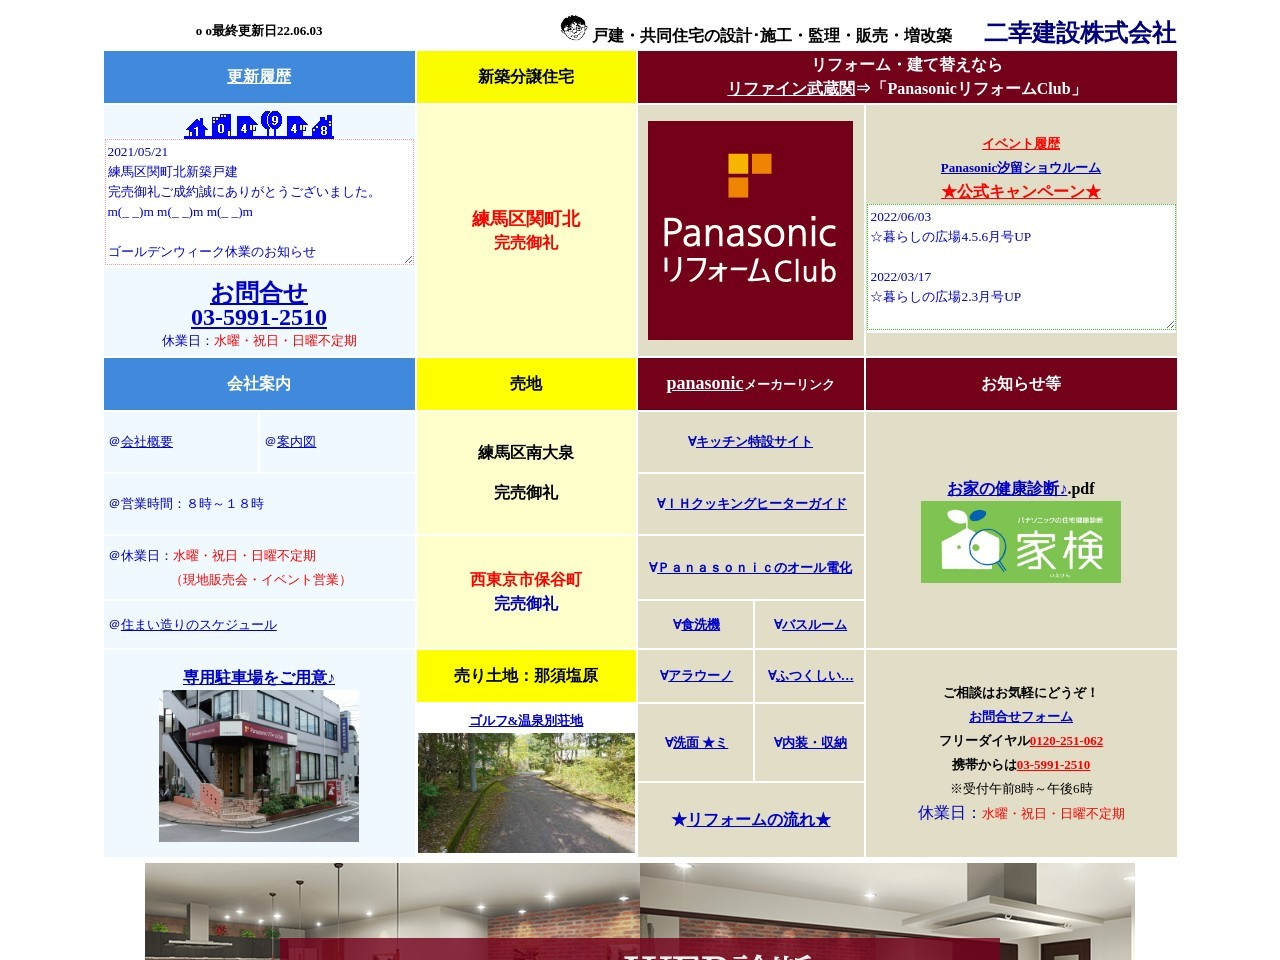 PanasonicリフォームClub二幸建設株式会社